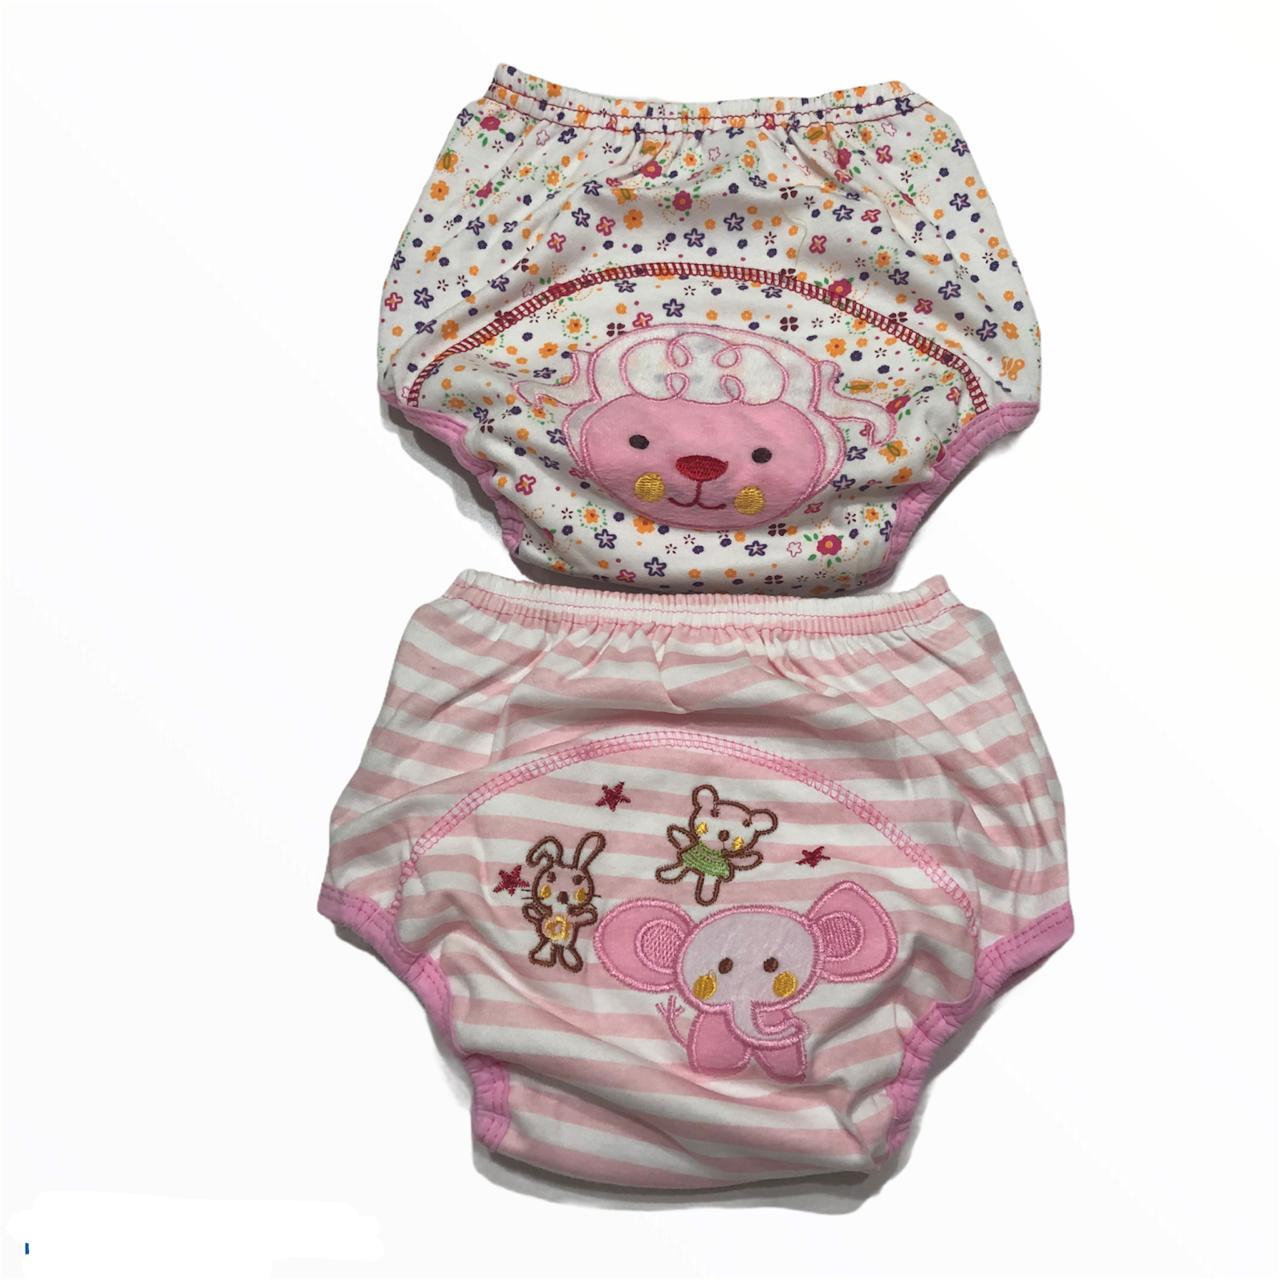 Kit Calcinha Treinamento Desfralde 2unds Rosa Animais - Baby